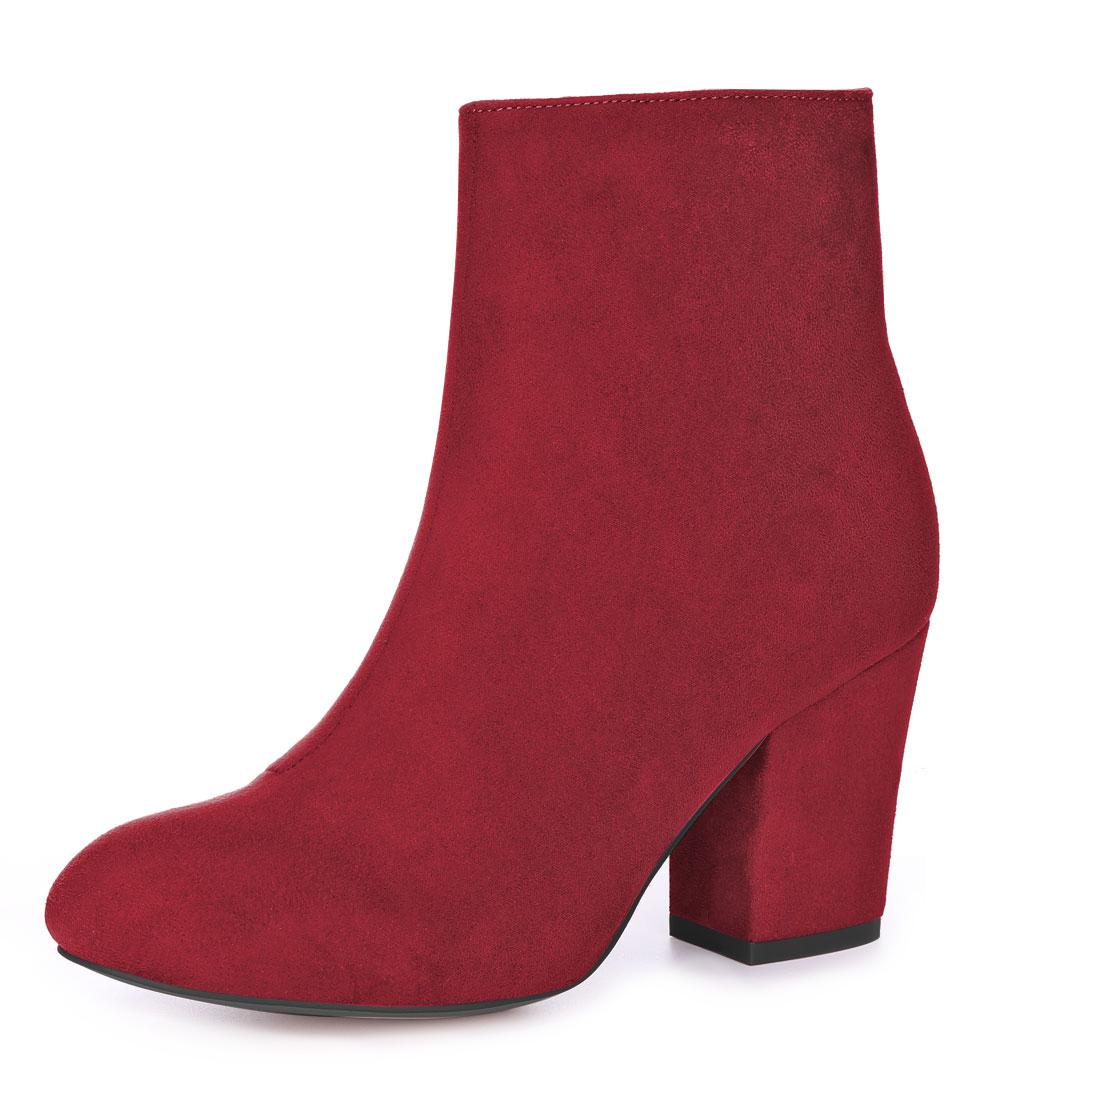 Allegra K Women Round Toe Side Zipper Block Heel Ankle Boots Red US 6